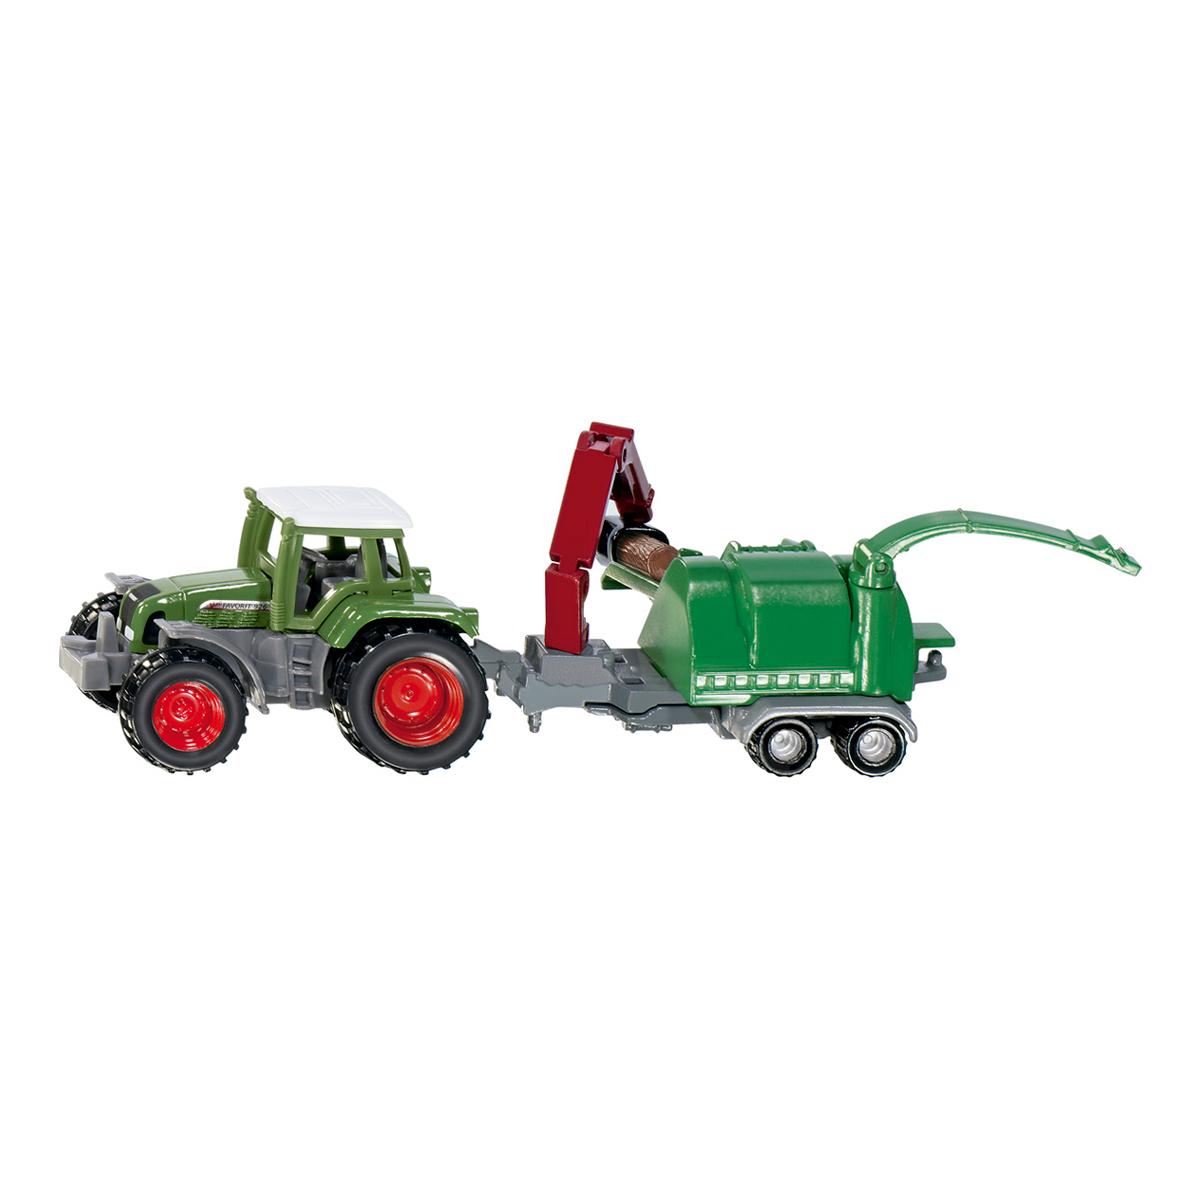 Fendt トラクター 木材粉砕機付き (ジク・SIKU)